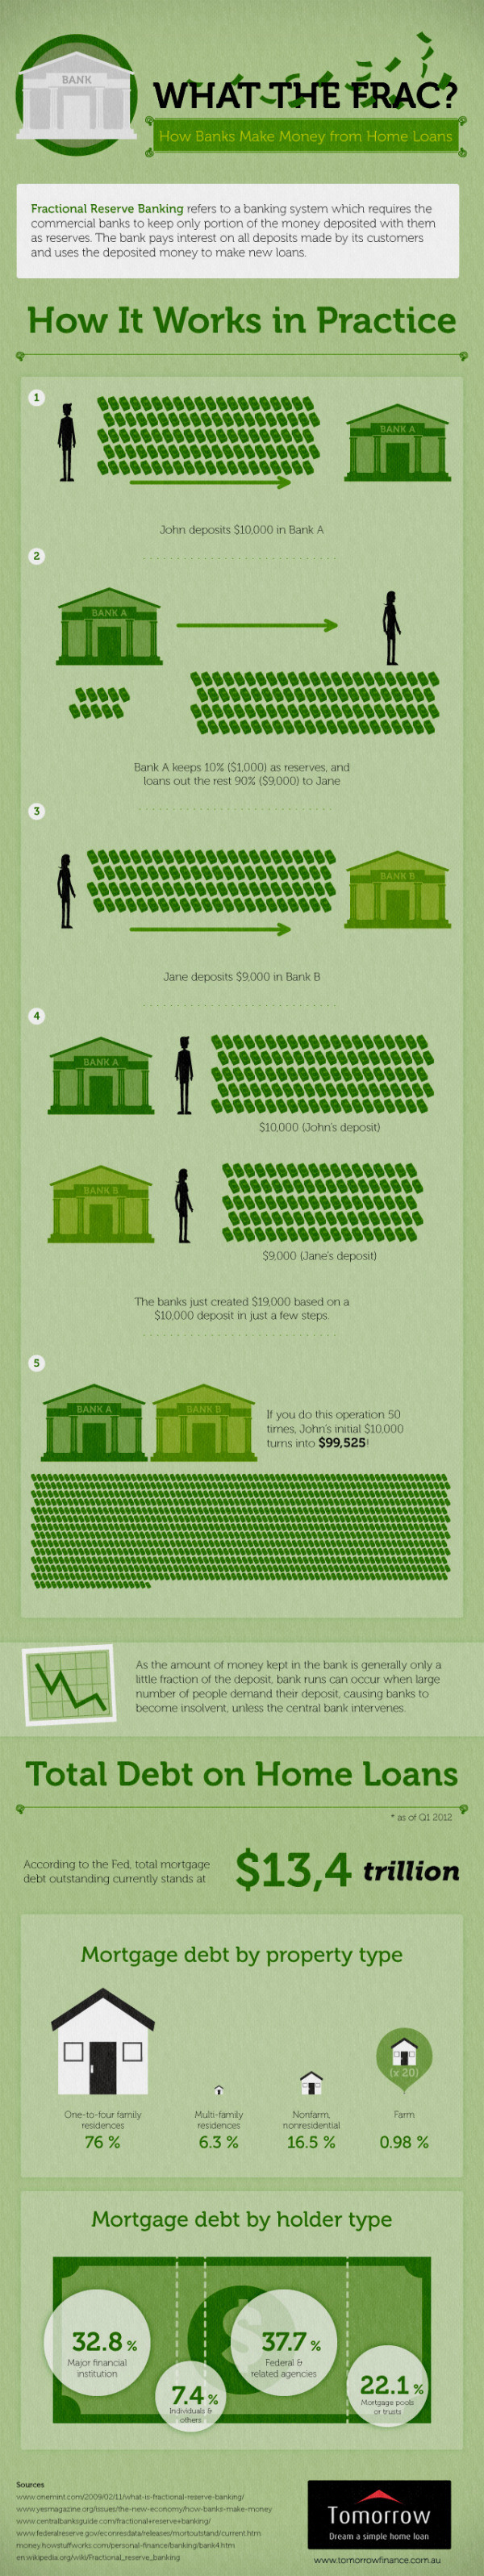 banks-money-home-loans